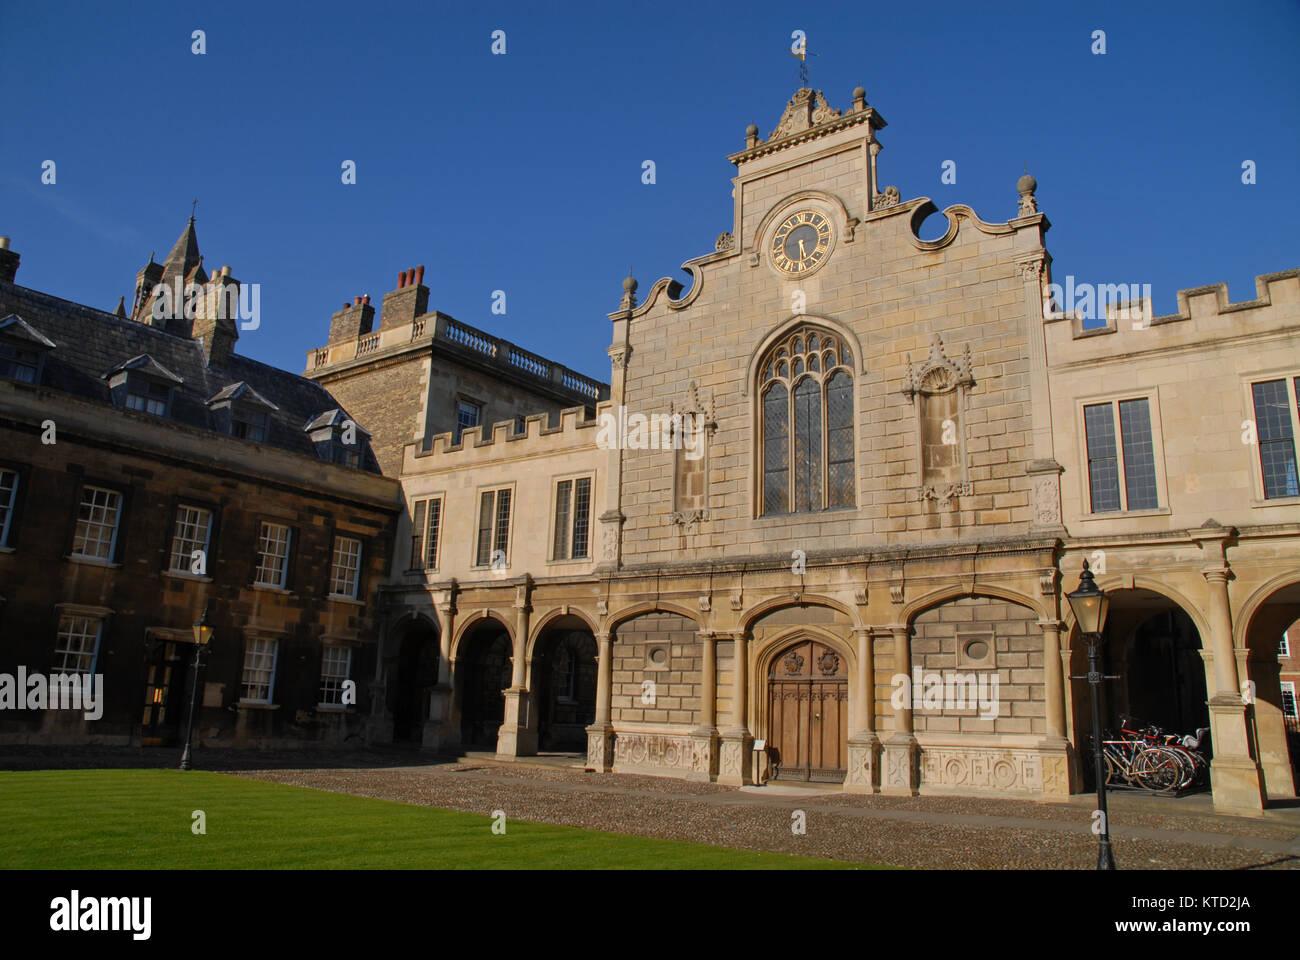 Cambridge, United Kingdom - April 18, 2015: Old Court at Peterhouse - Stock Image